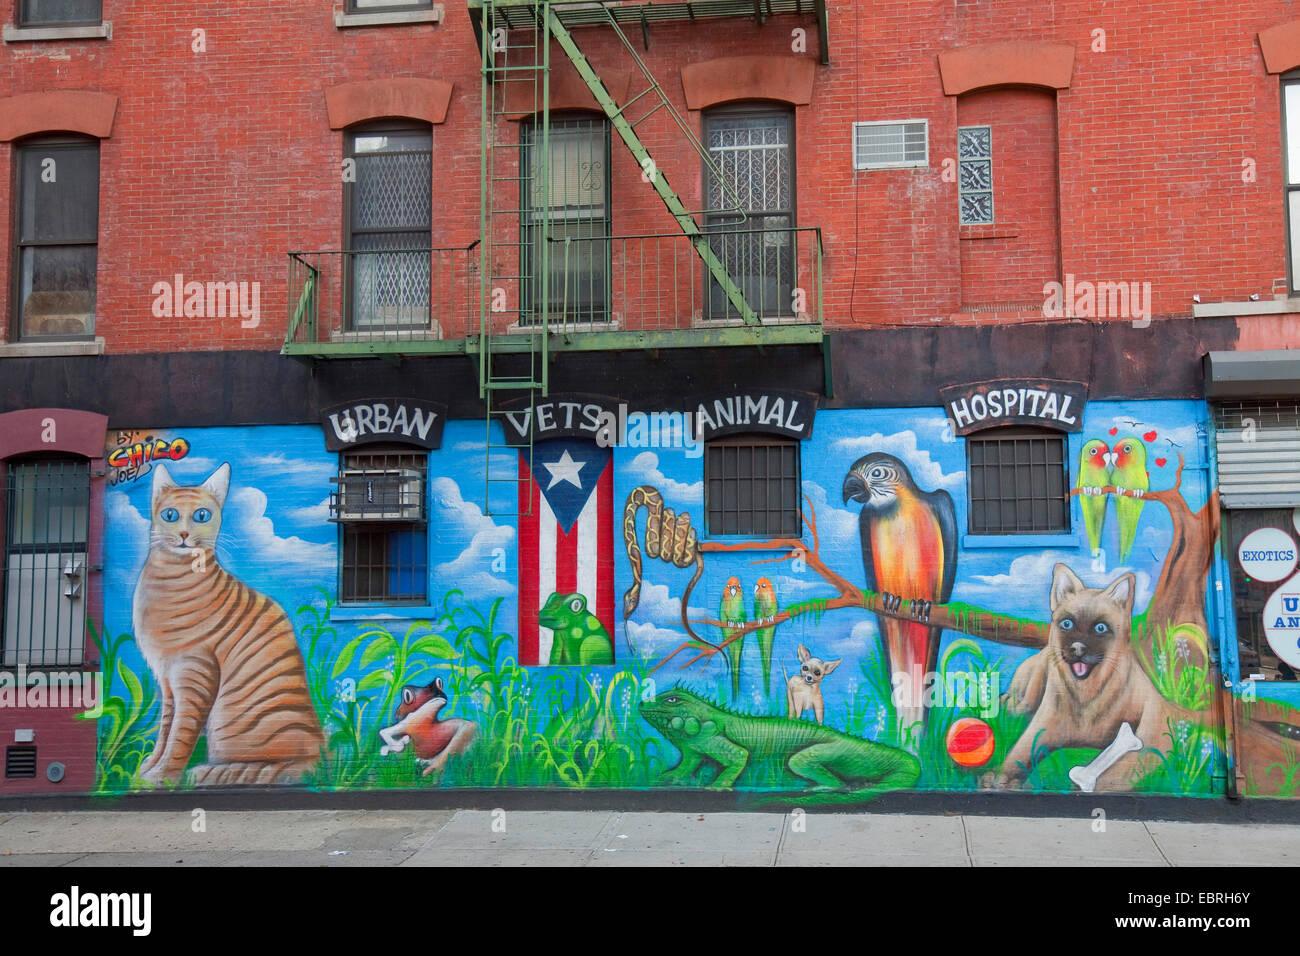 Graffiti En La Pared De La Casa Usa East Village La Ciudad De - Graffitis-en-casa